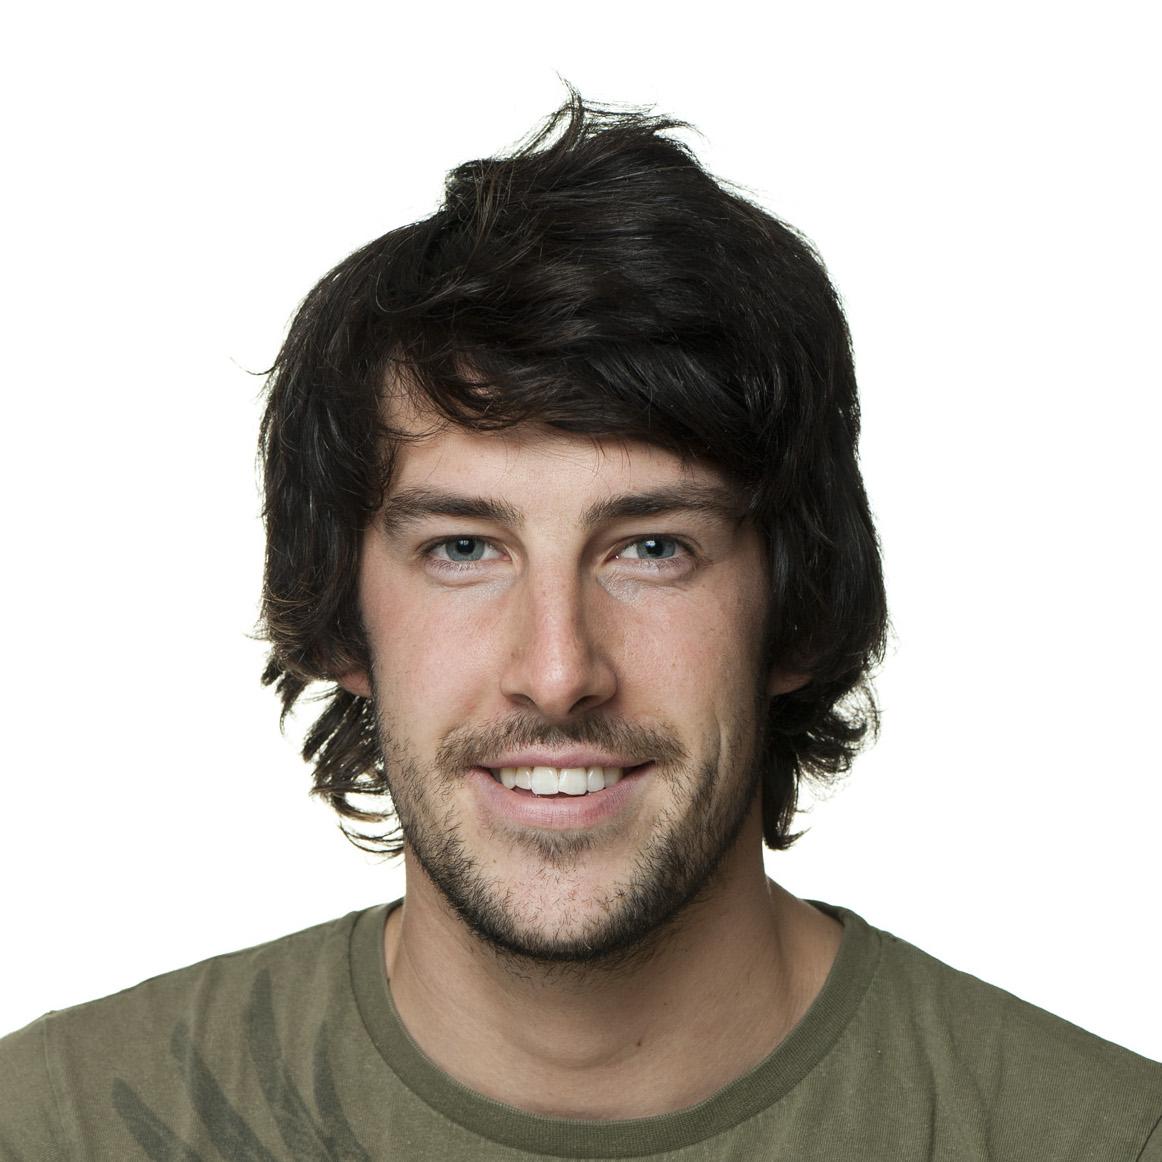 Jorgen Alsgaard